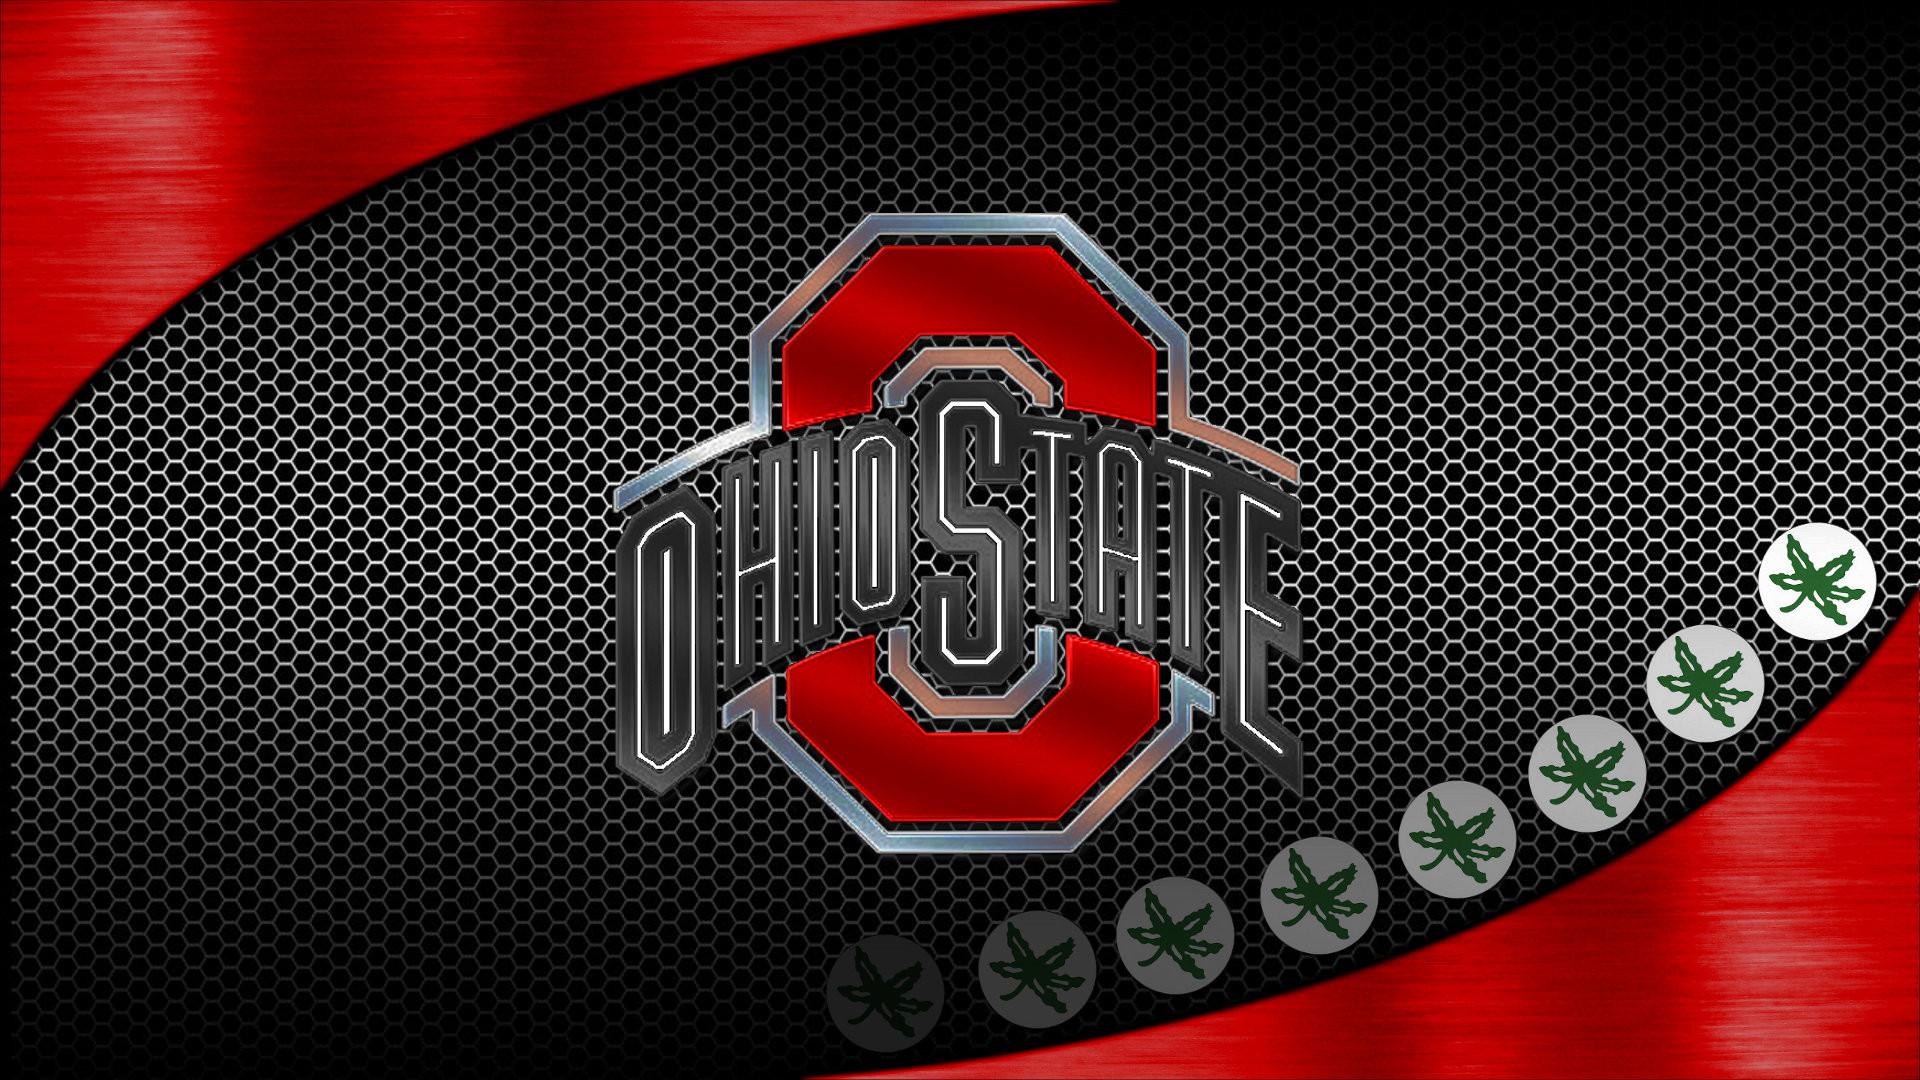 OSU Wallpaper 532 | Ohio State Buckeyes | Pinterest